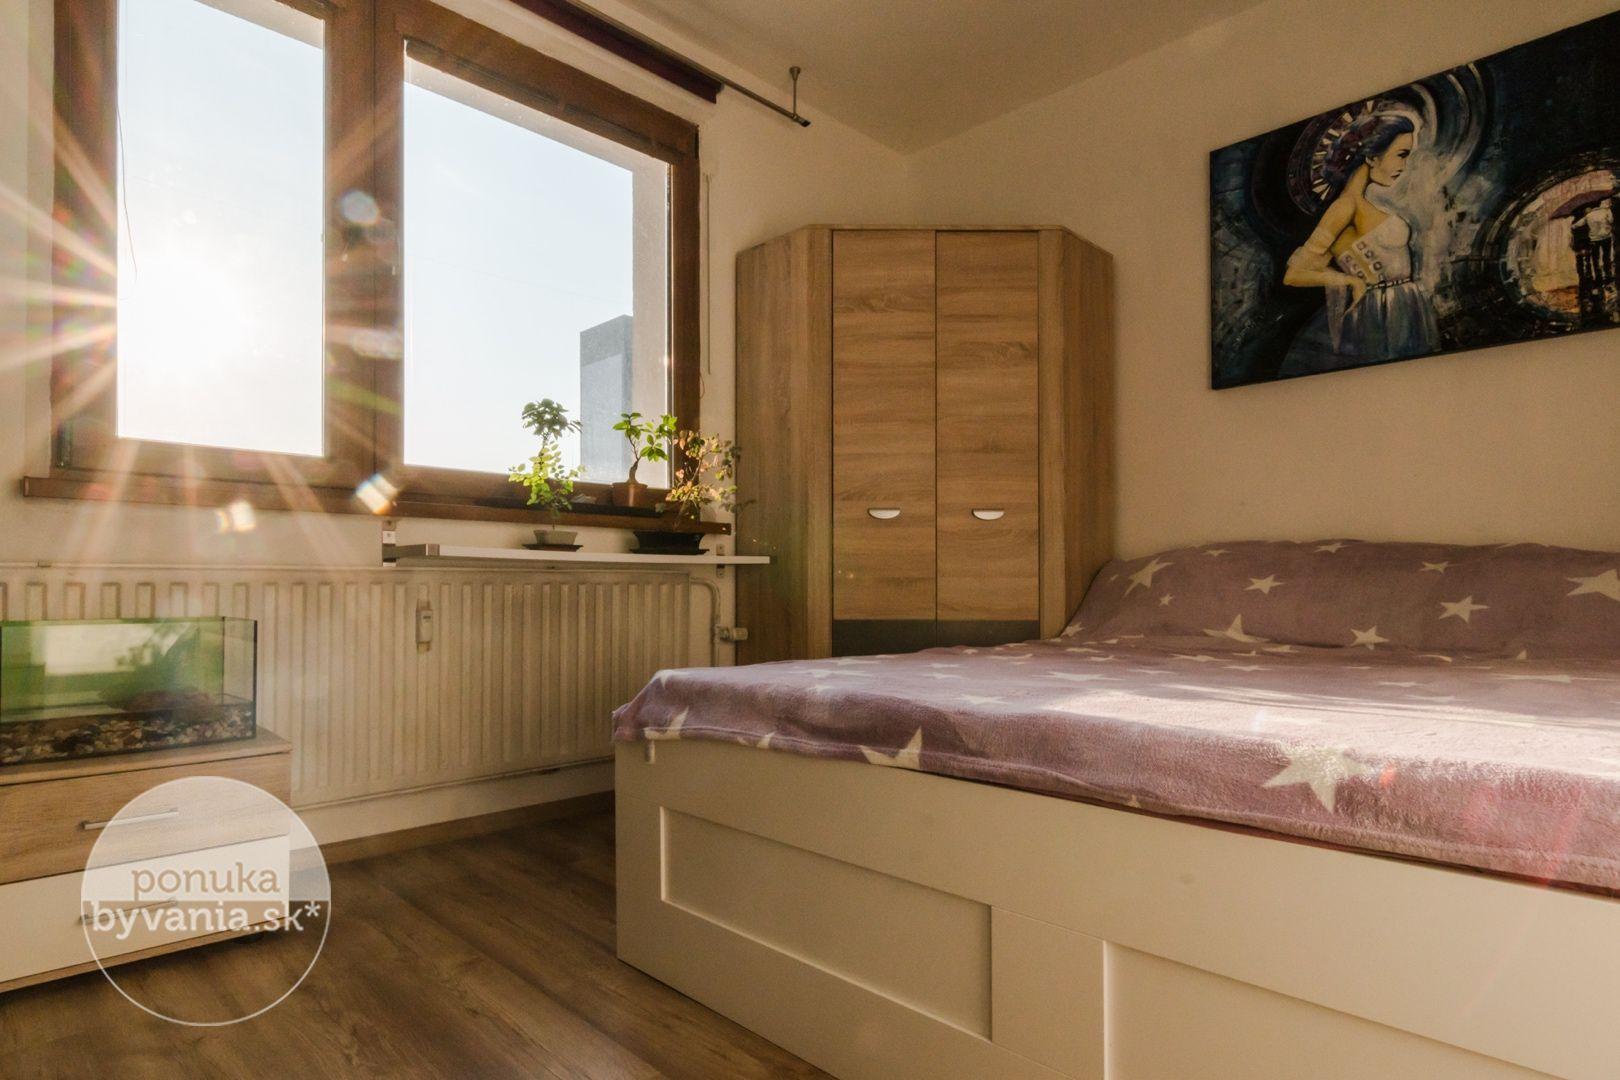 ponukabyvania.sk_Iľjušinova_3-izbový-byt_BEREC